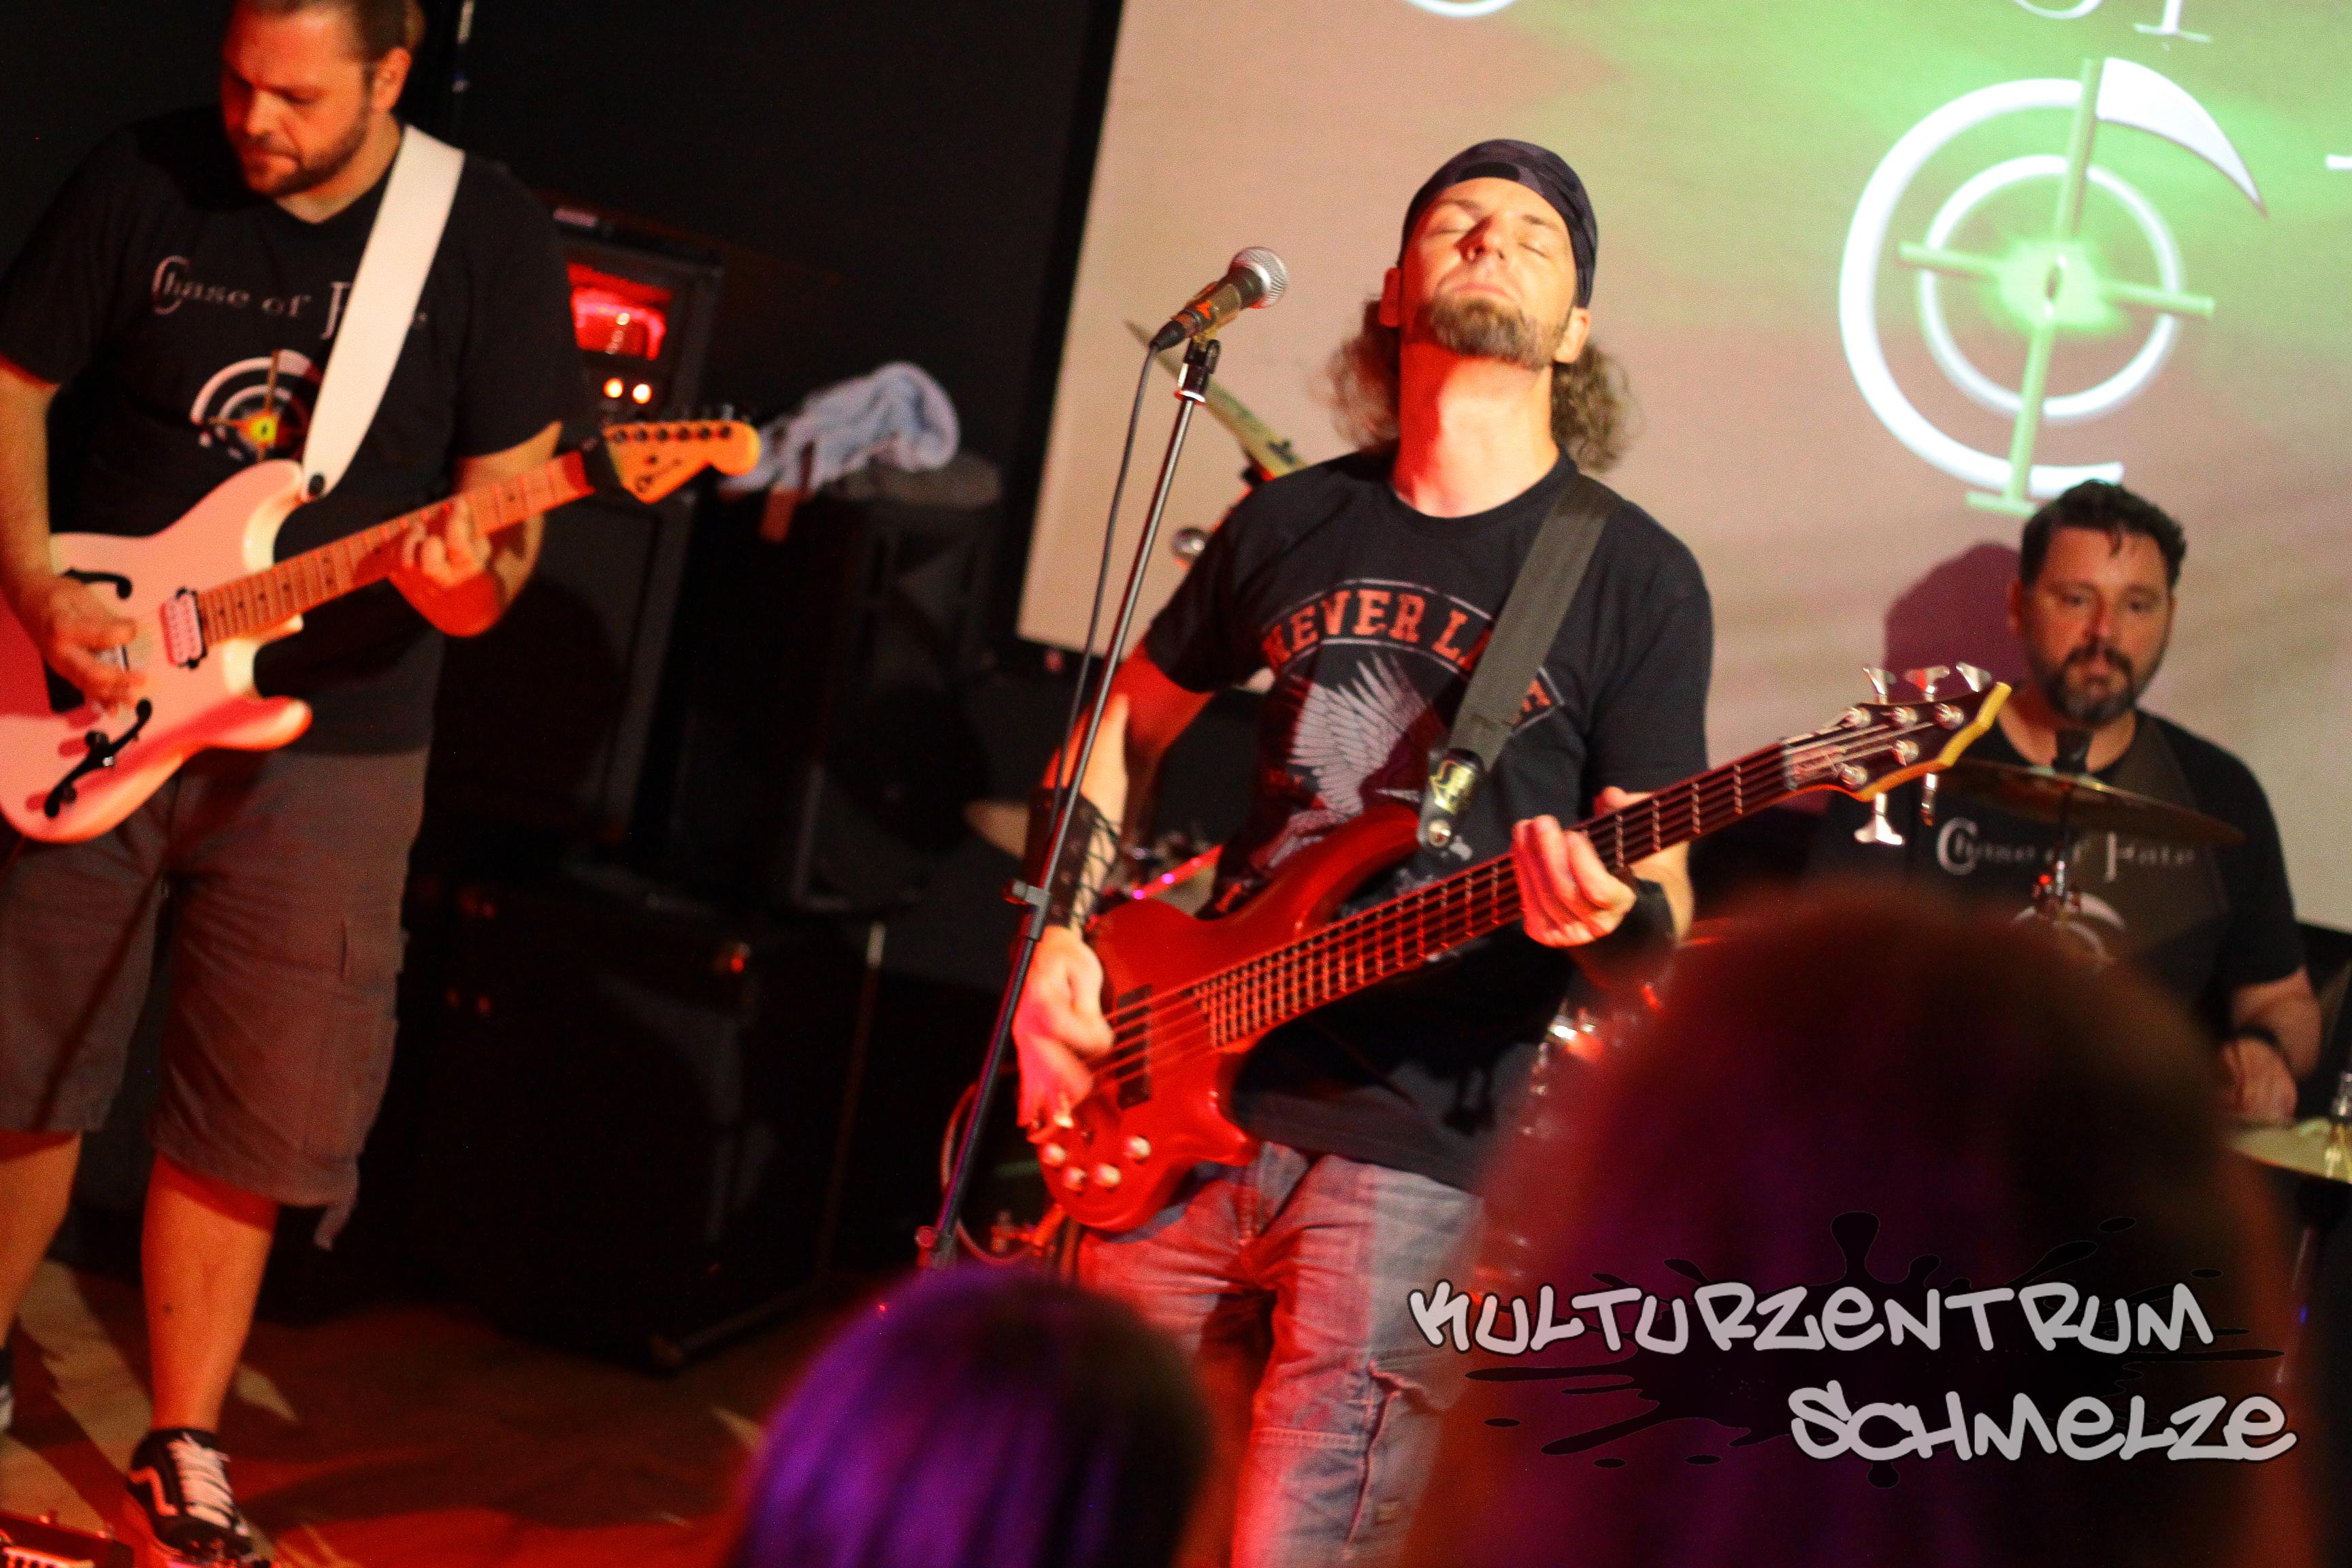 Chase_Of_Fate_Moreno_Kulturzentrum_Schmelze_Metal_Hard_Rock_Wien_Hip_Hop